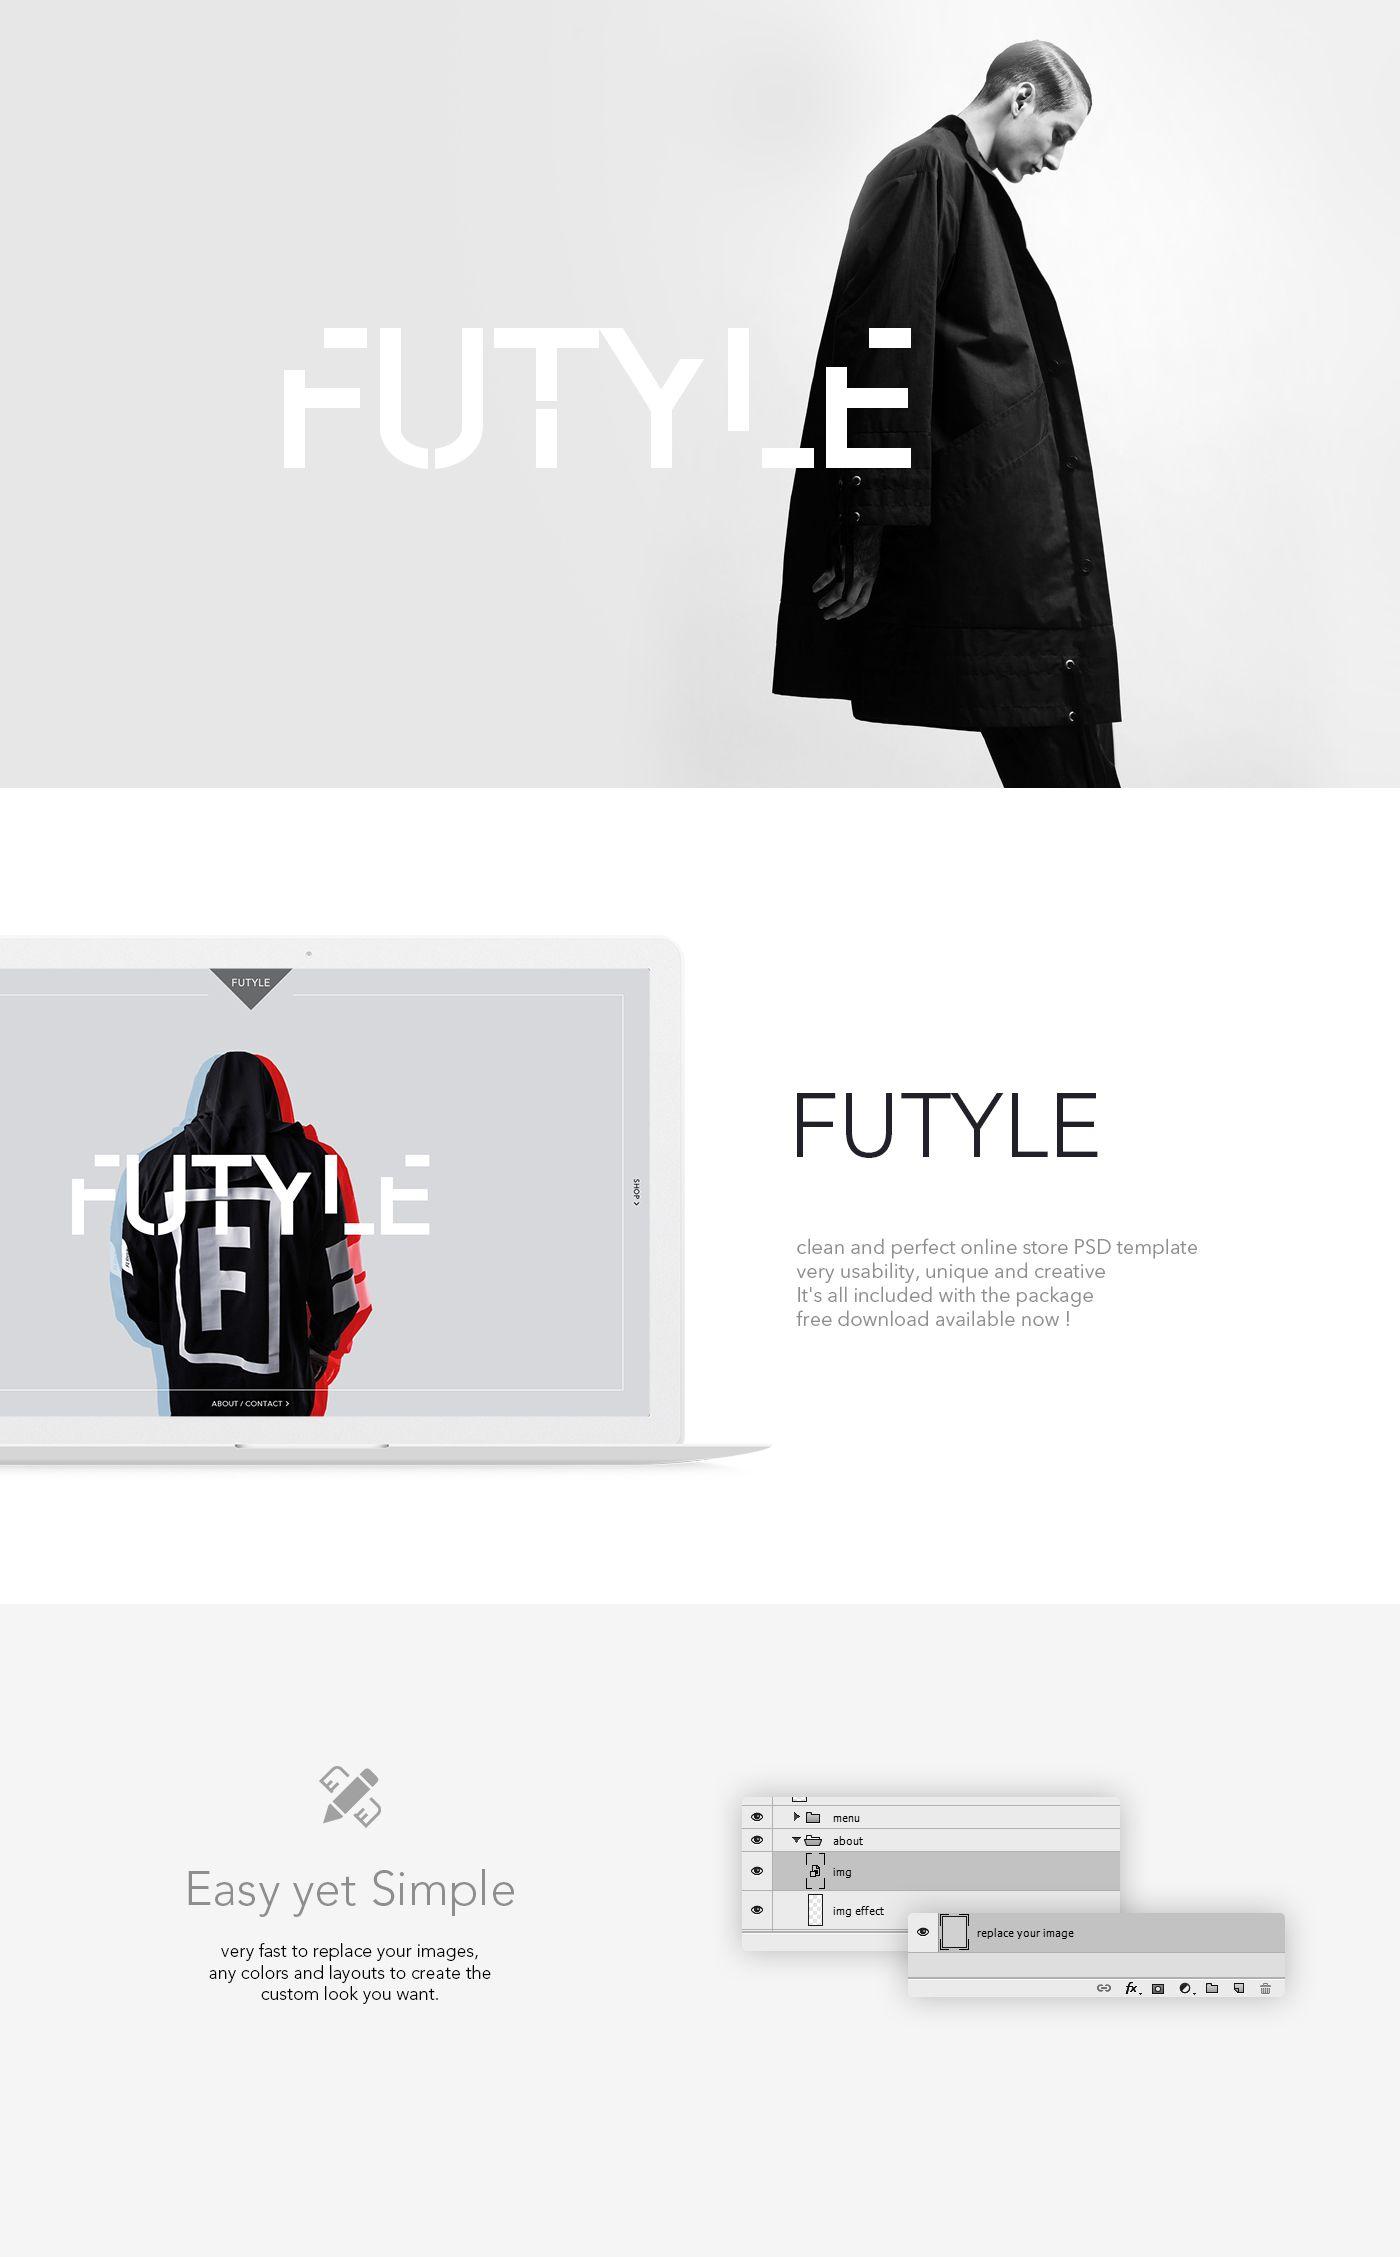 FUTYLE online store PSD Template - FreebiesTeam #free #download #psd ...